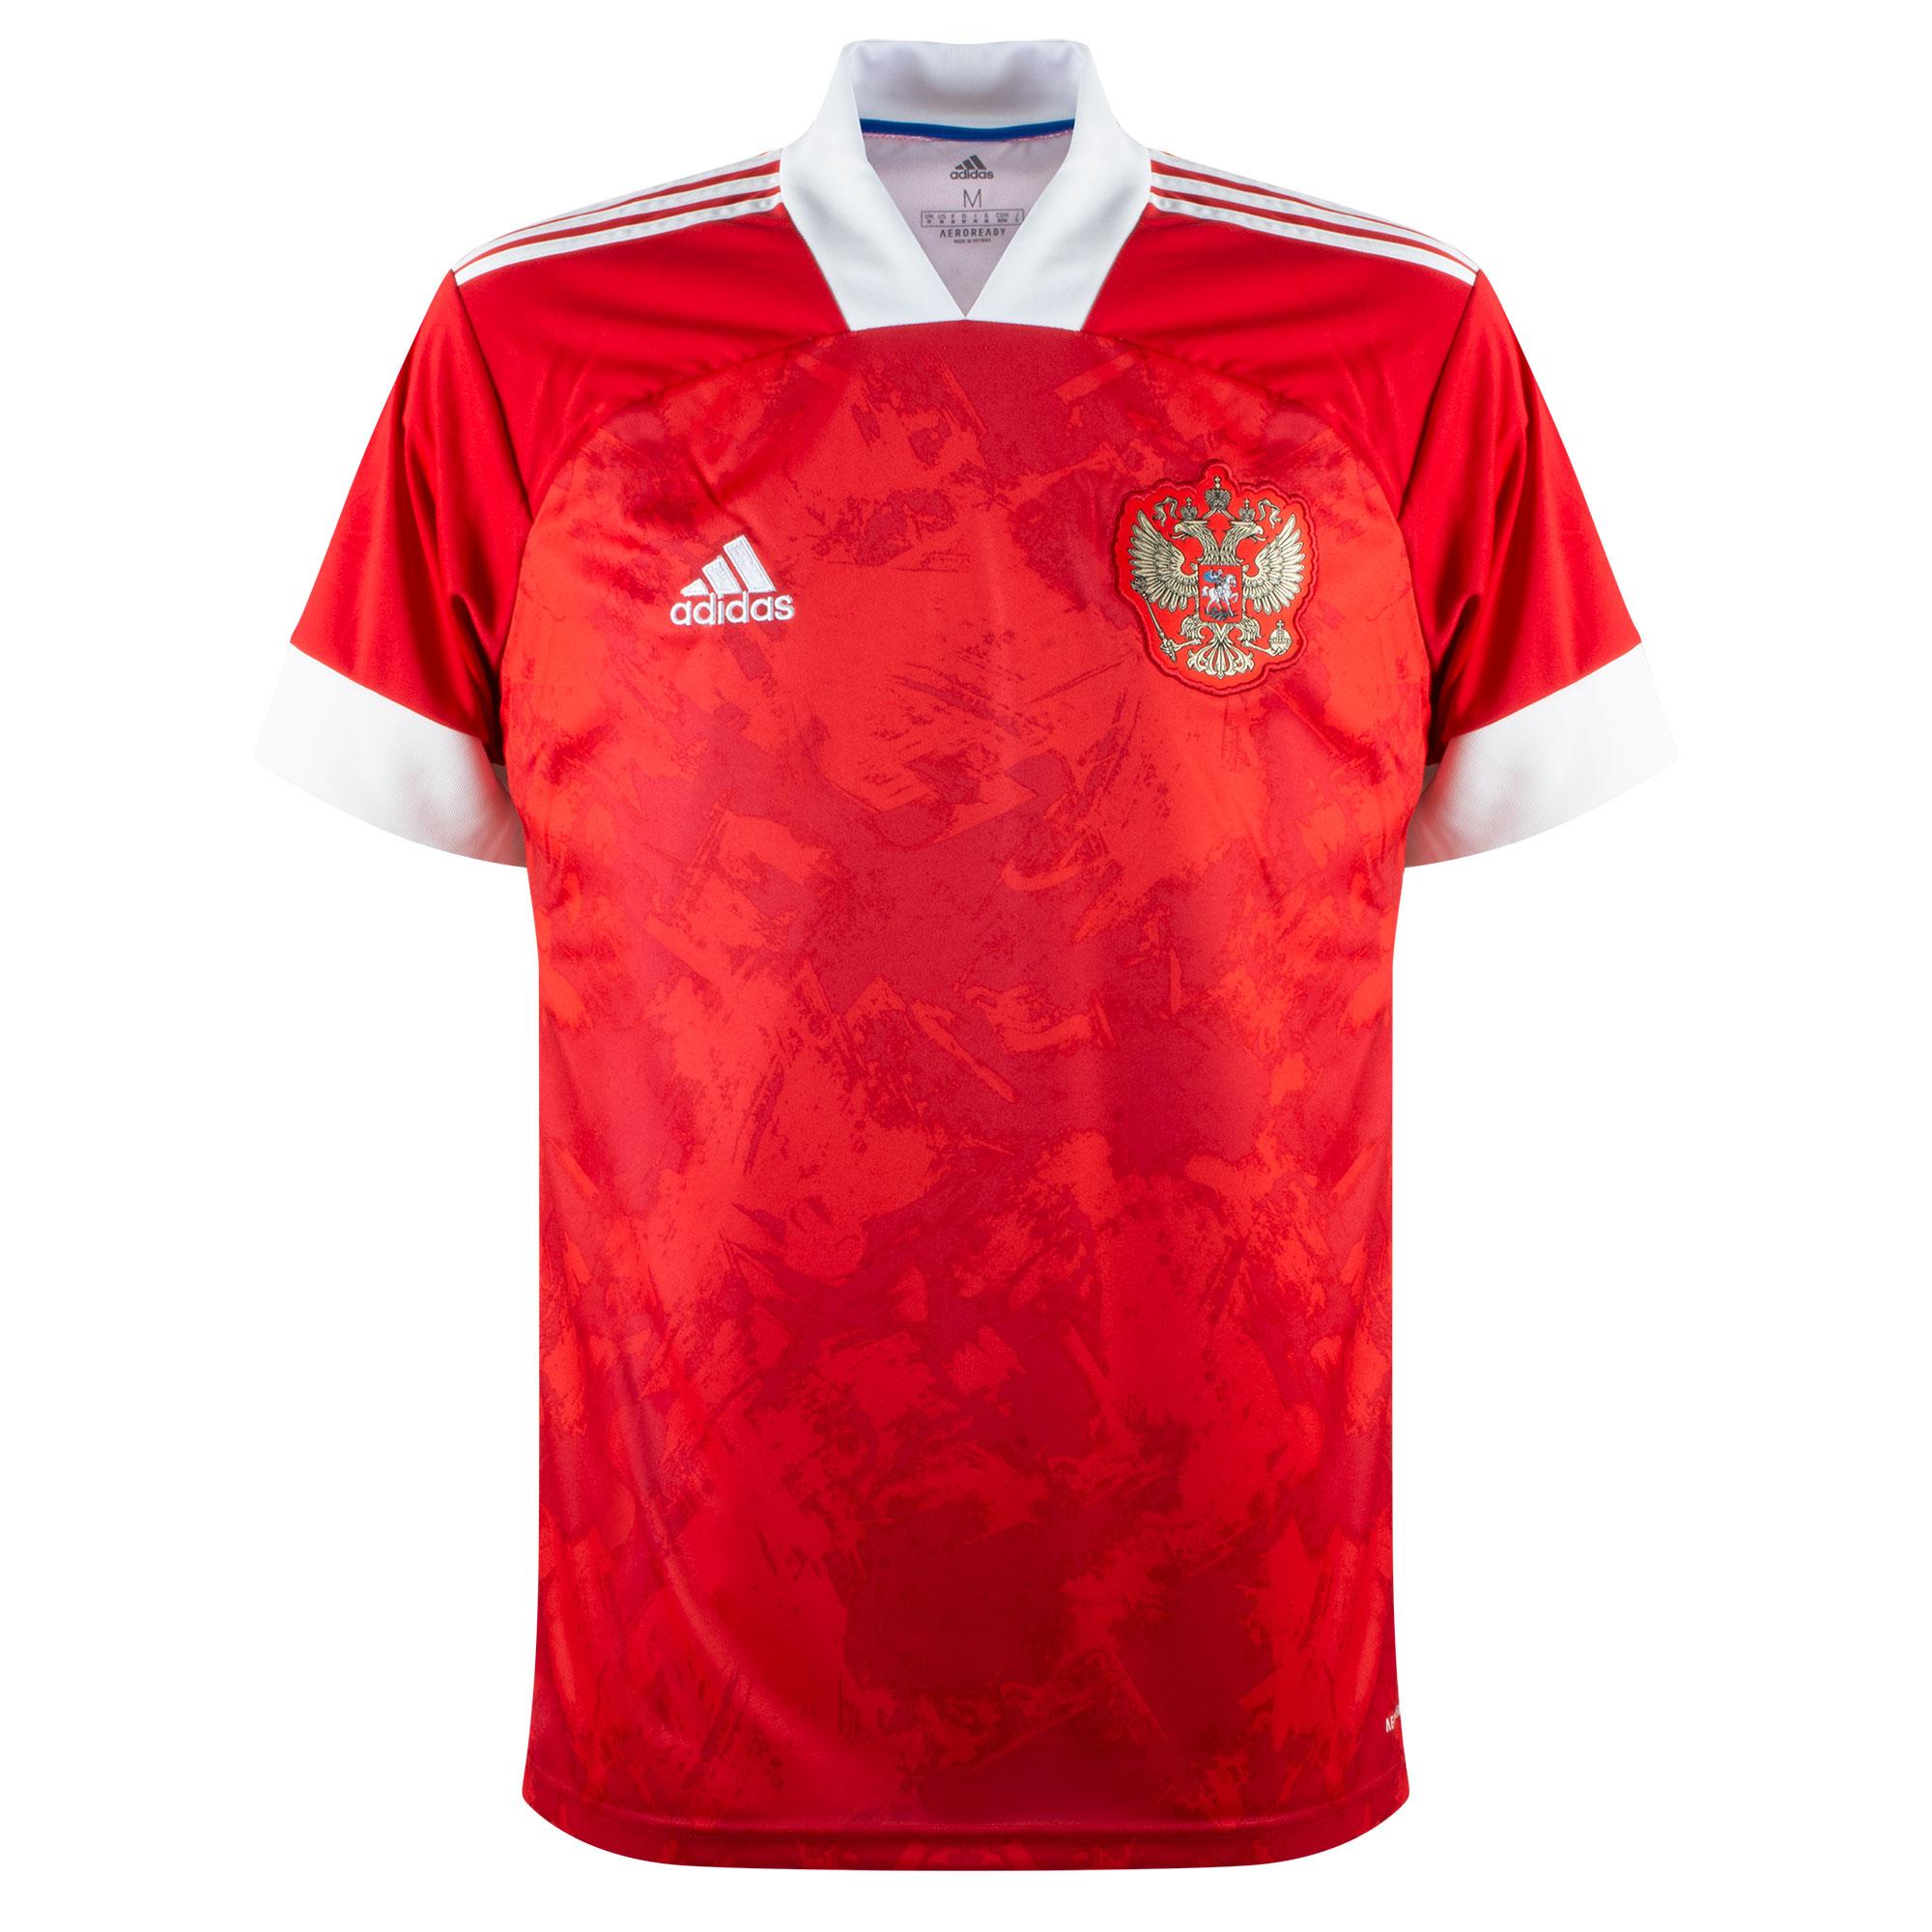 adidas Russia Home Shirt 2020-2021